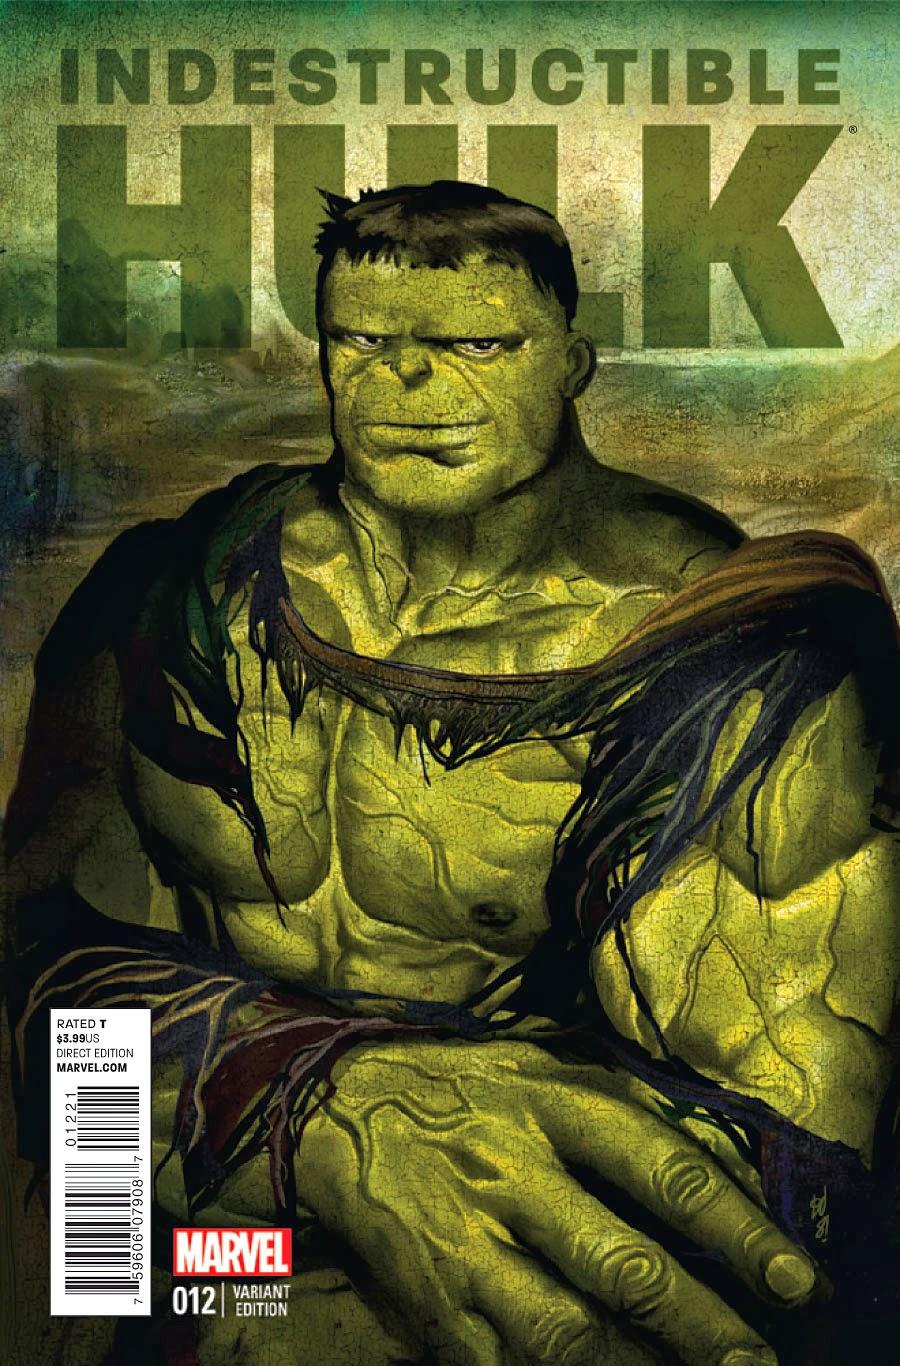 indestructible hulk agent of time - photo #8